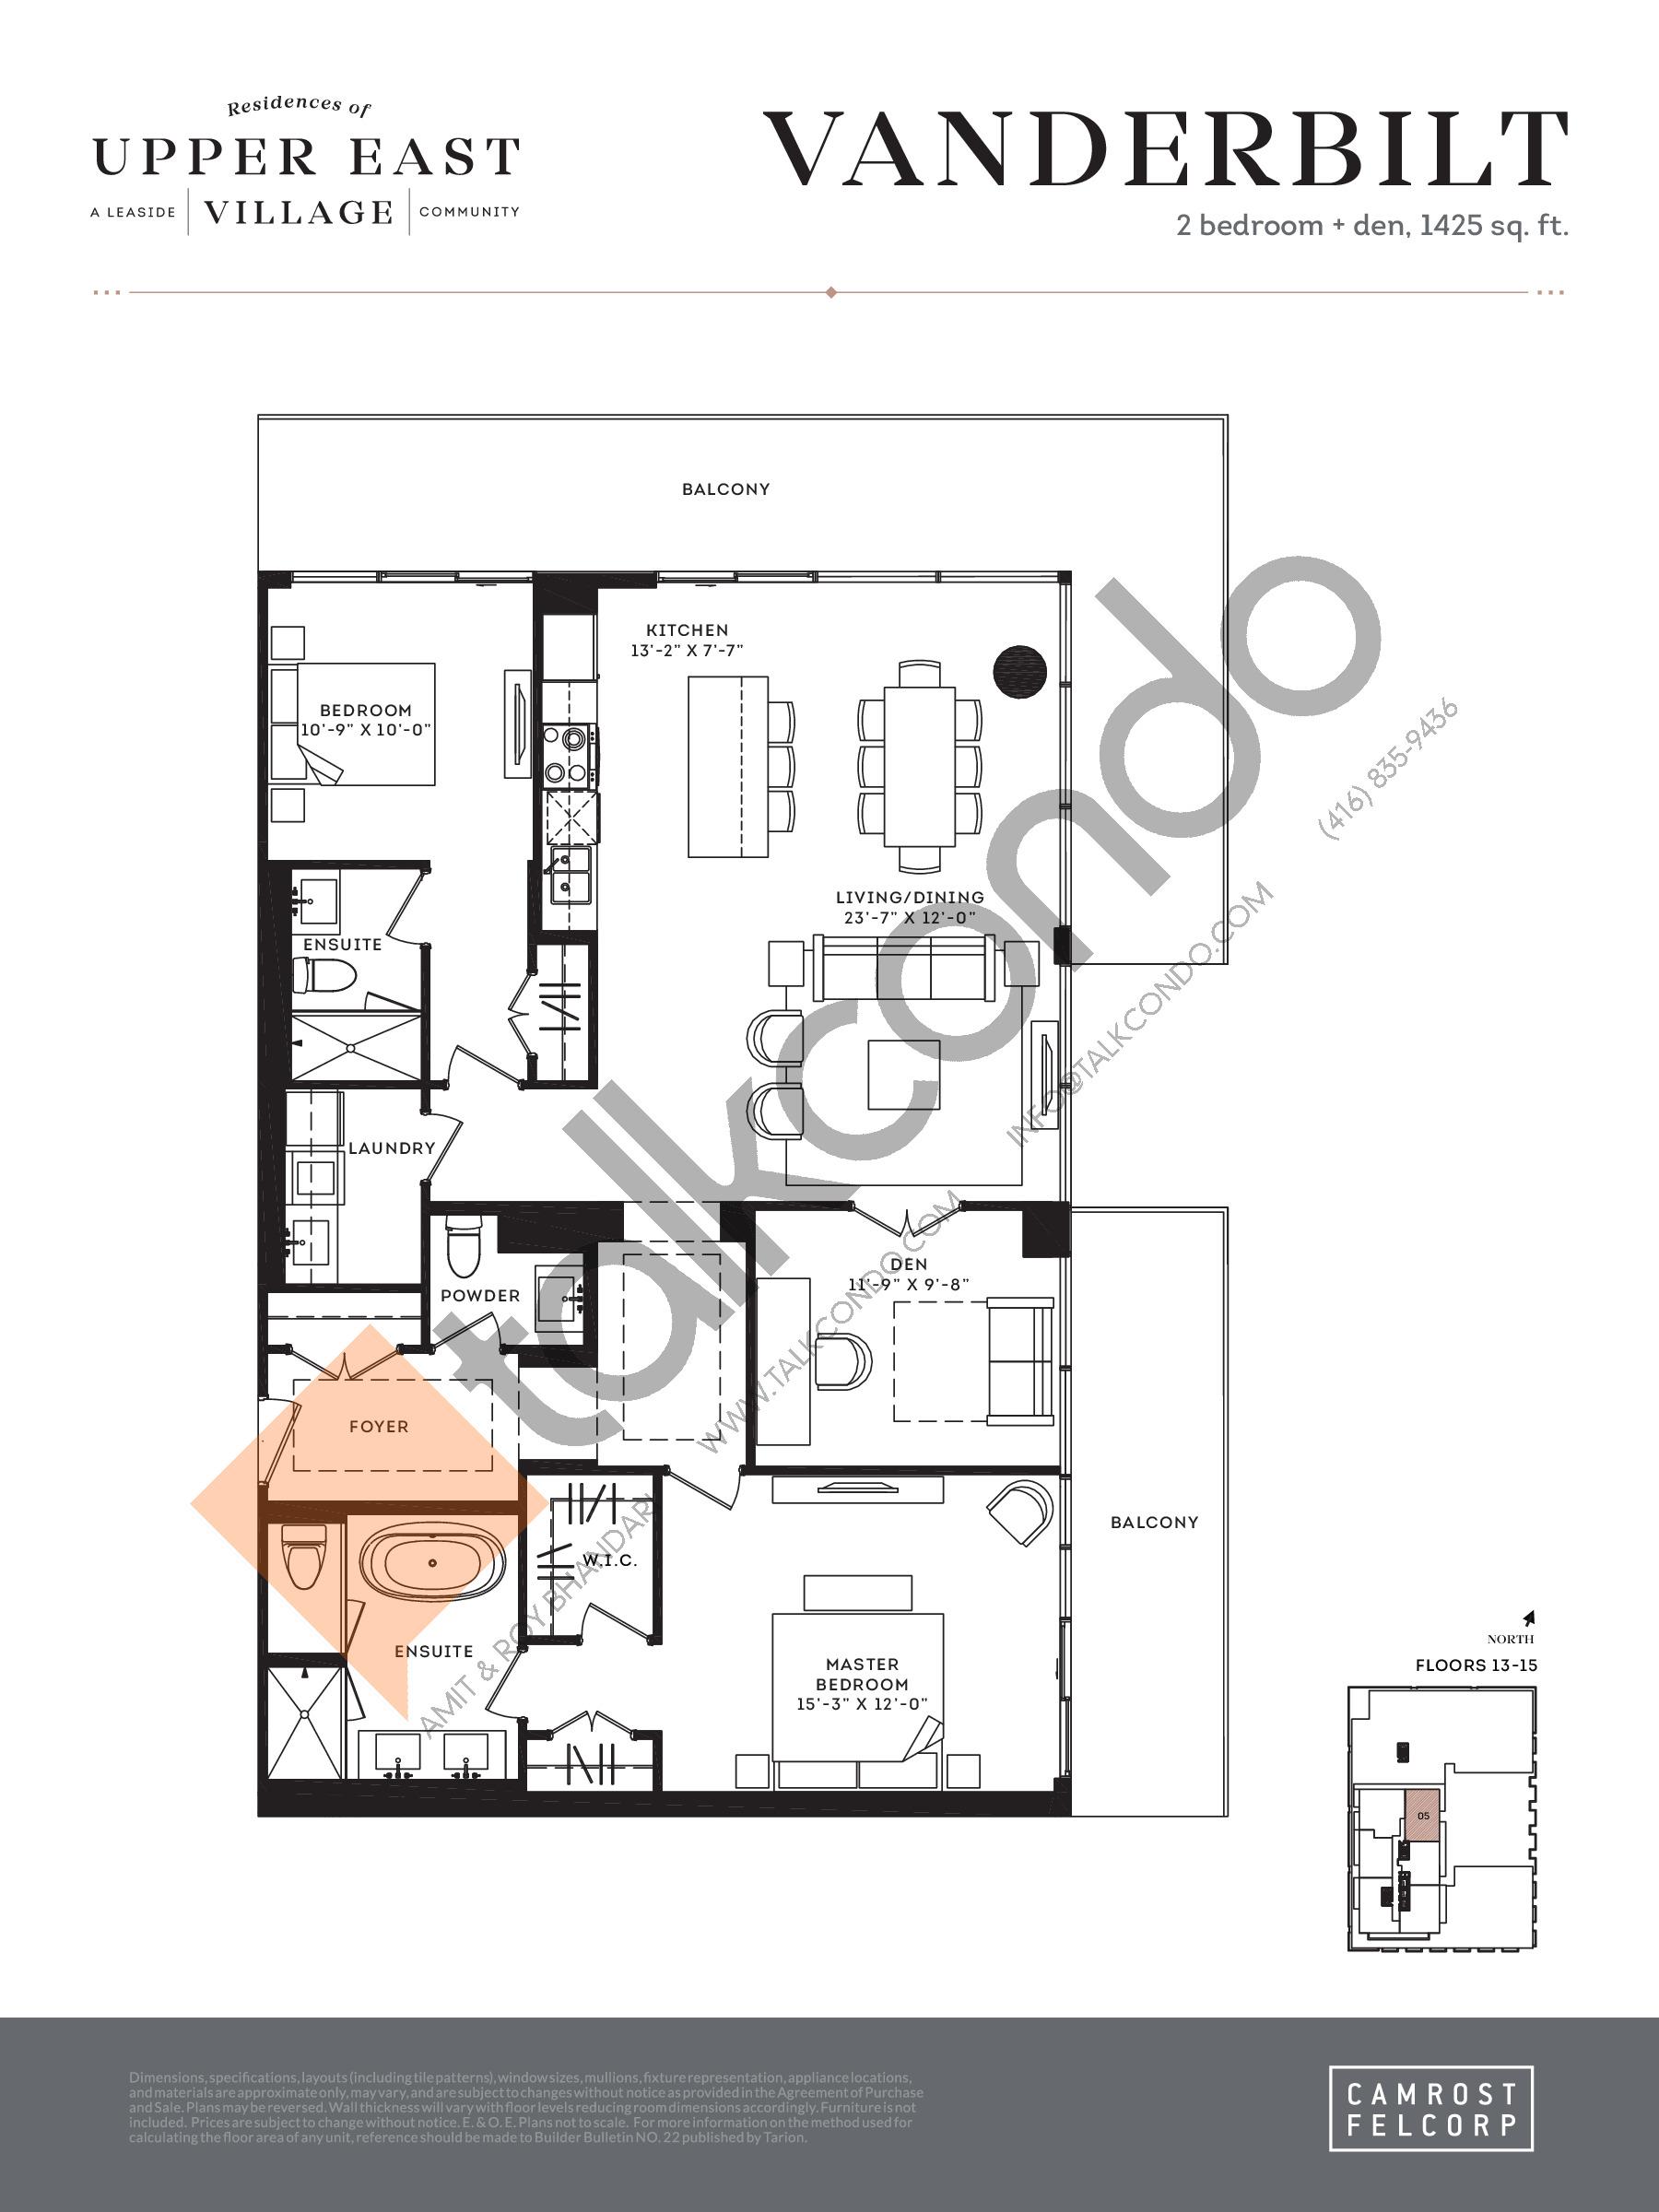 Vanderbilt (Signature Collection) Floor Plan at Upper East Village Condos - 1425 sq.ft